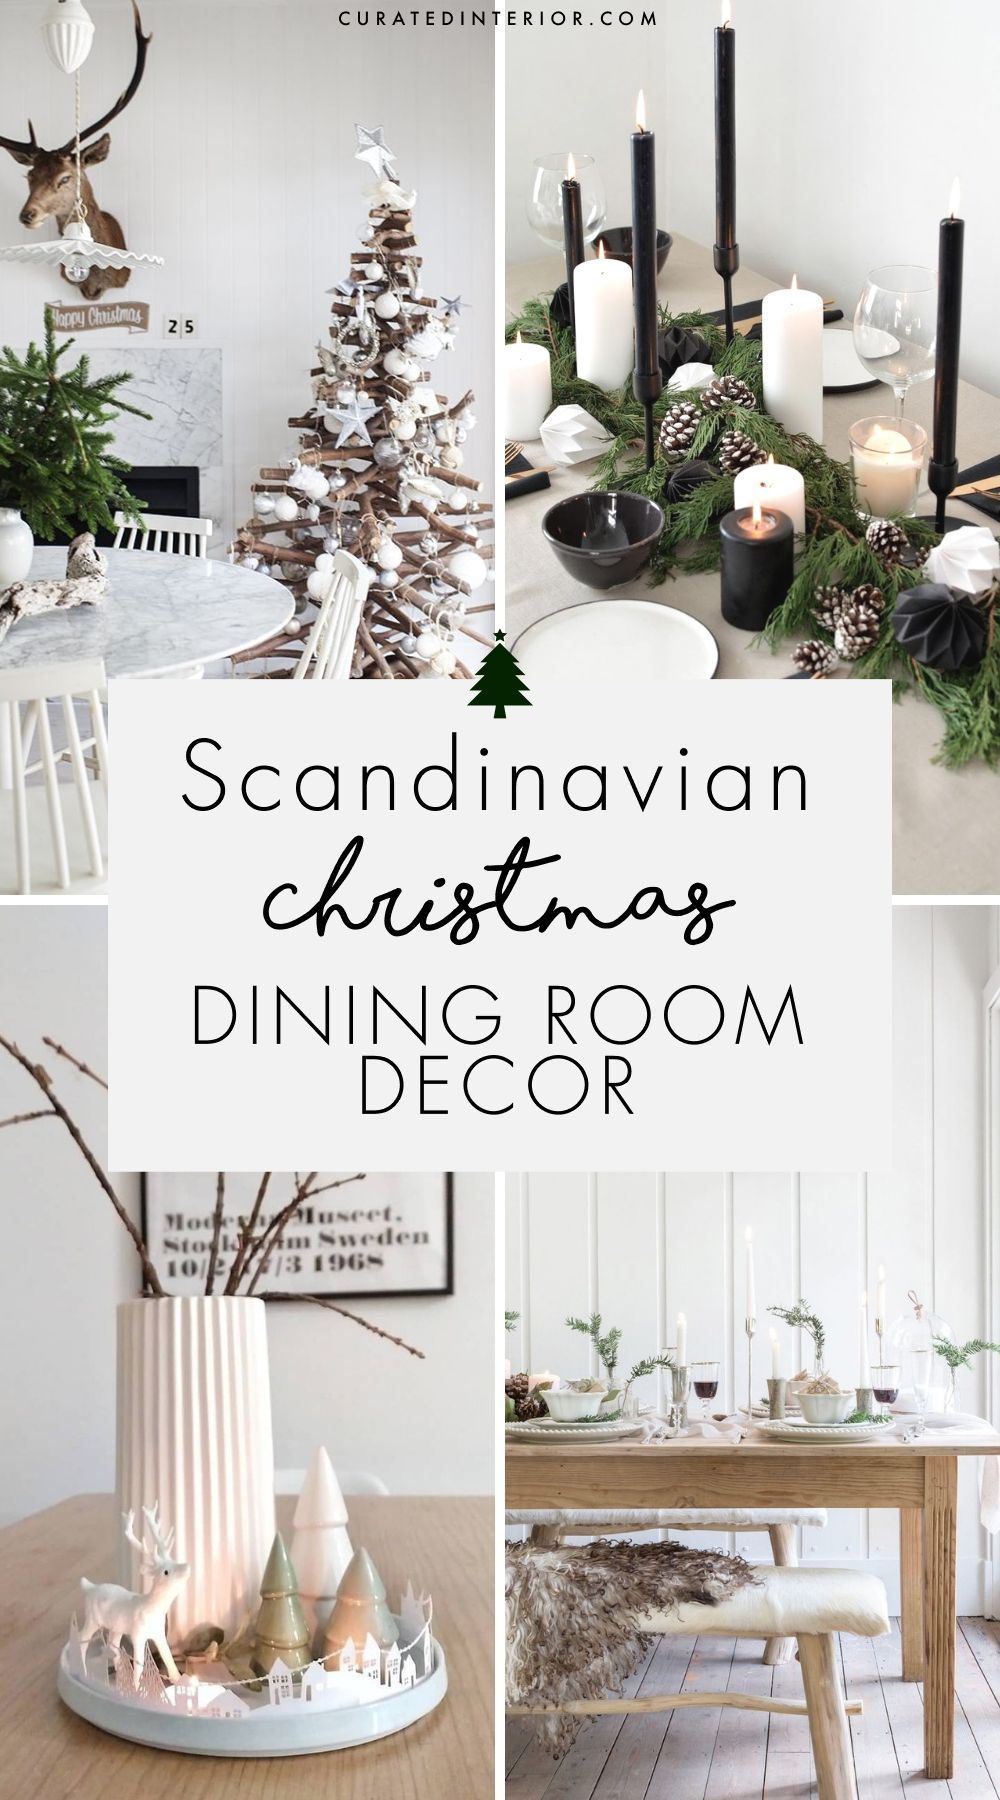 25 Scandinavian Christmas Dining Room Decor Ideas Christmas Dining Room Decor Christmas Dining Table Decor Christmas Interiors